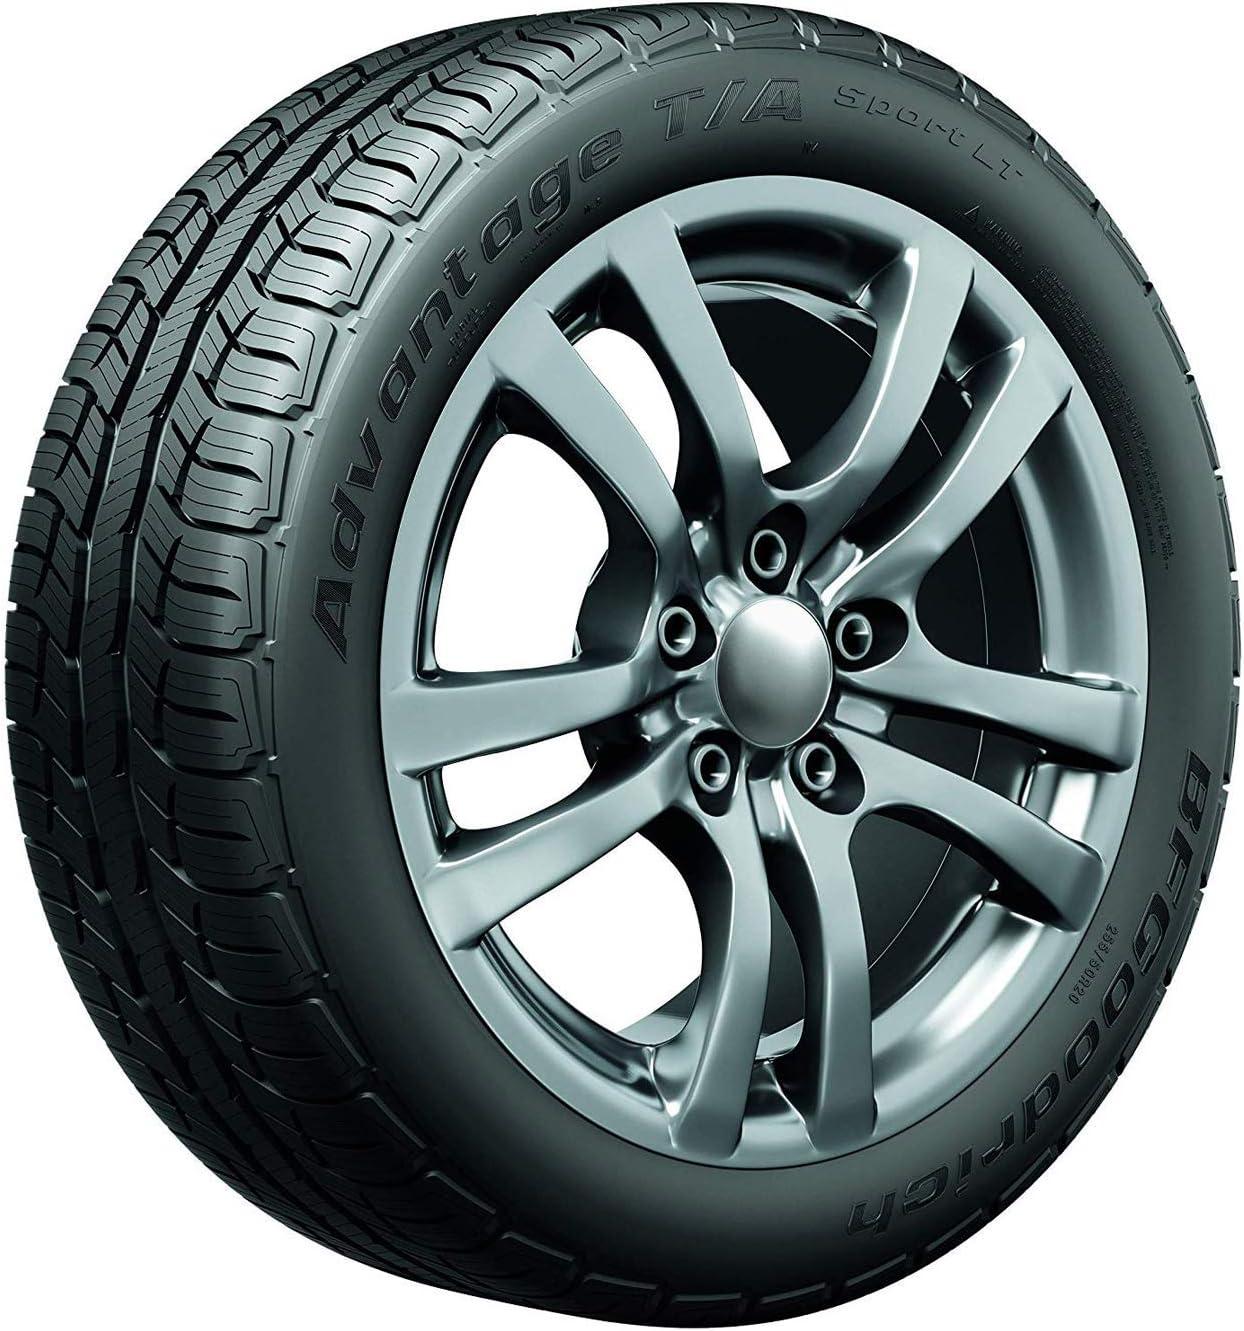 BFGoodrich Advantage T/A Sport All-Season Radial Tire